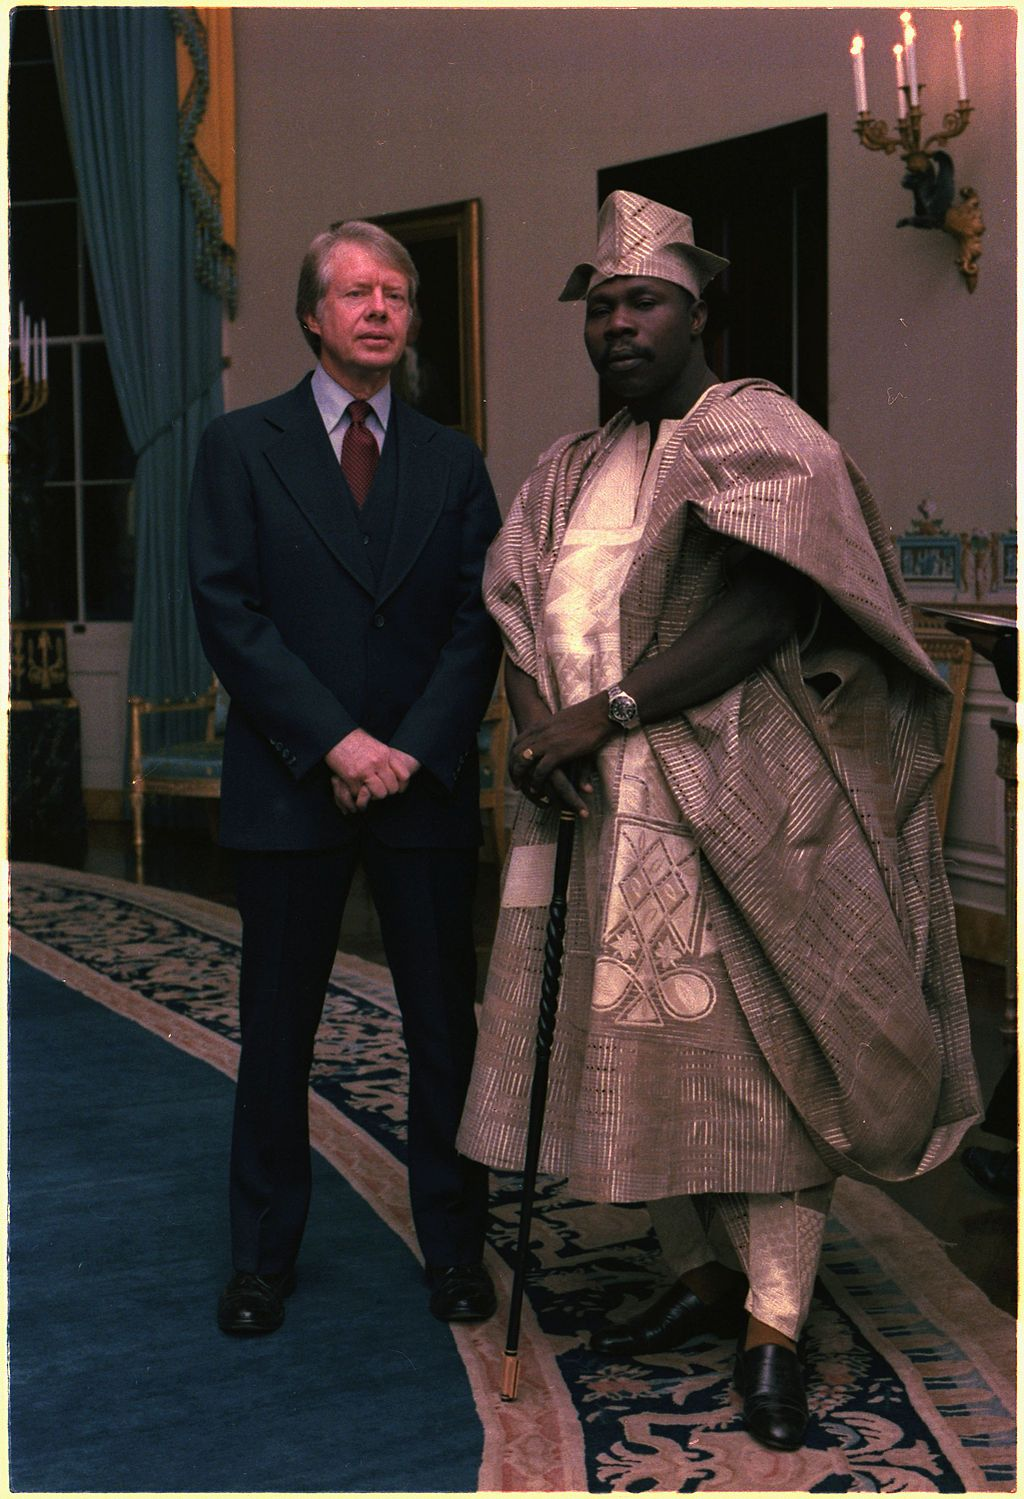 Tribes of Nigeria: picture of Olusegun Obasanjo